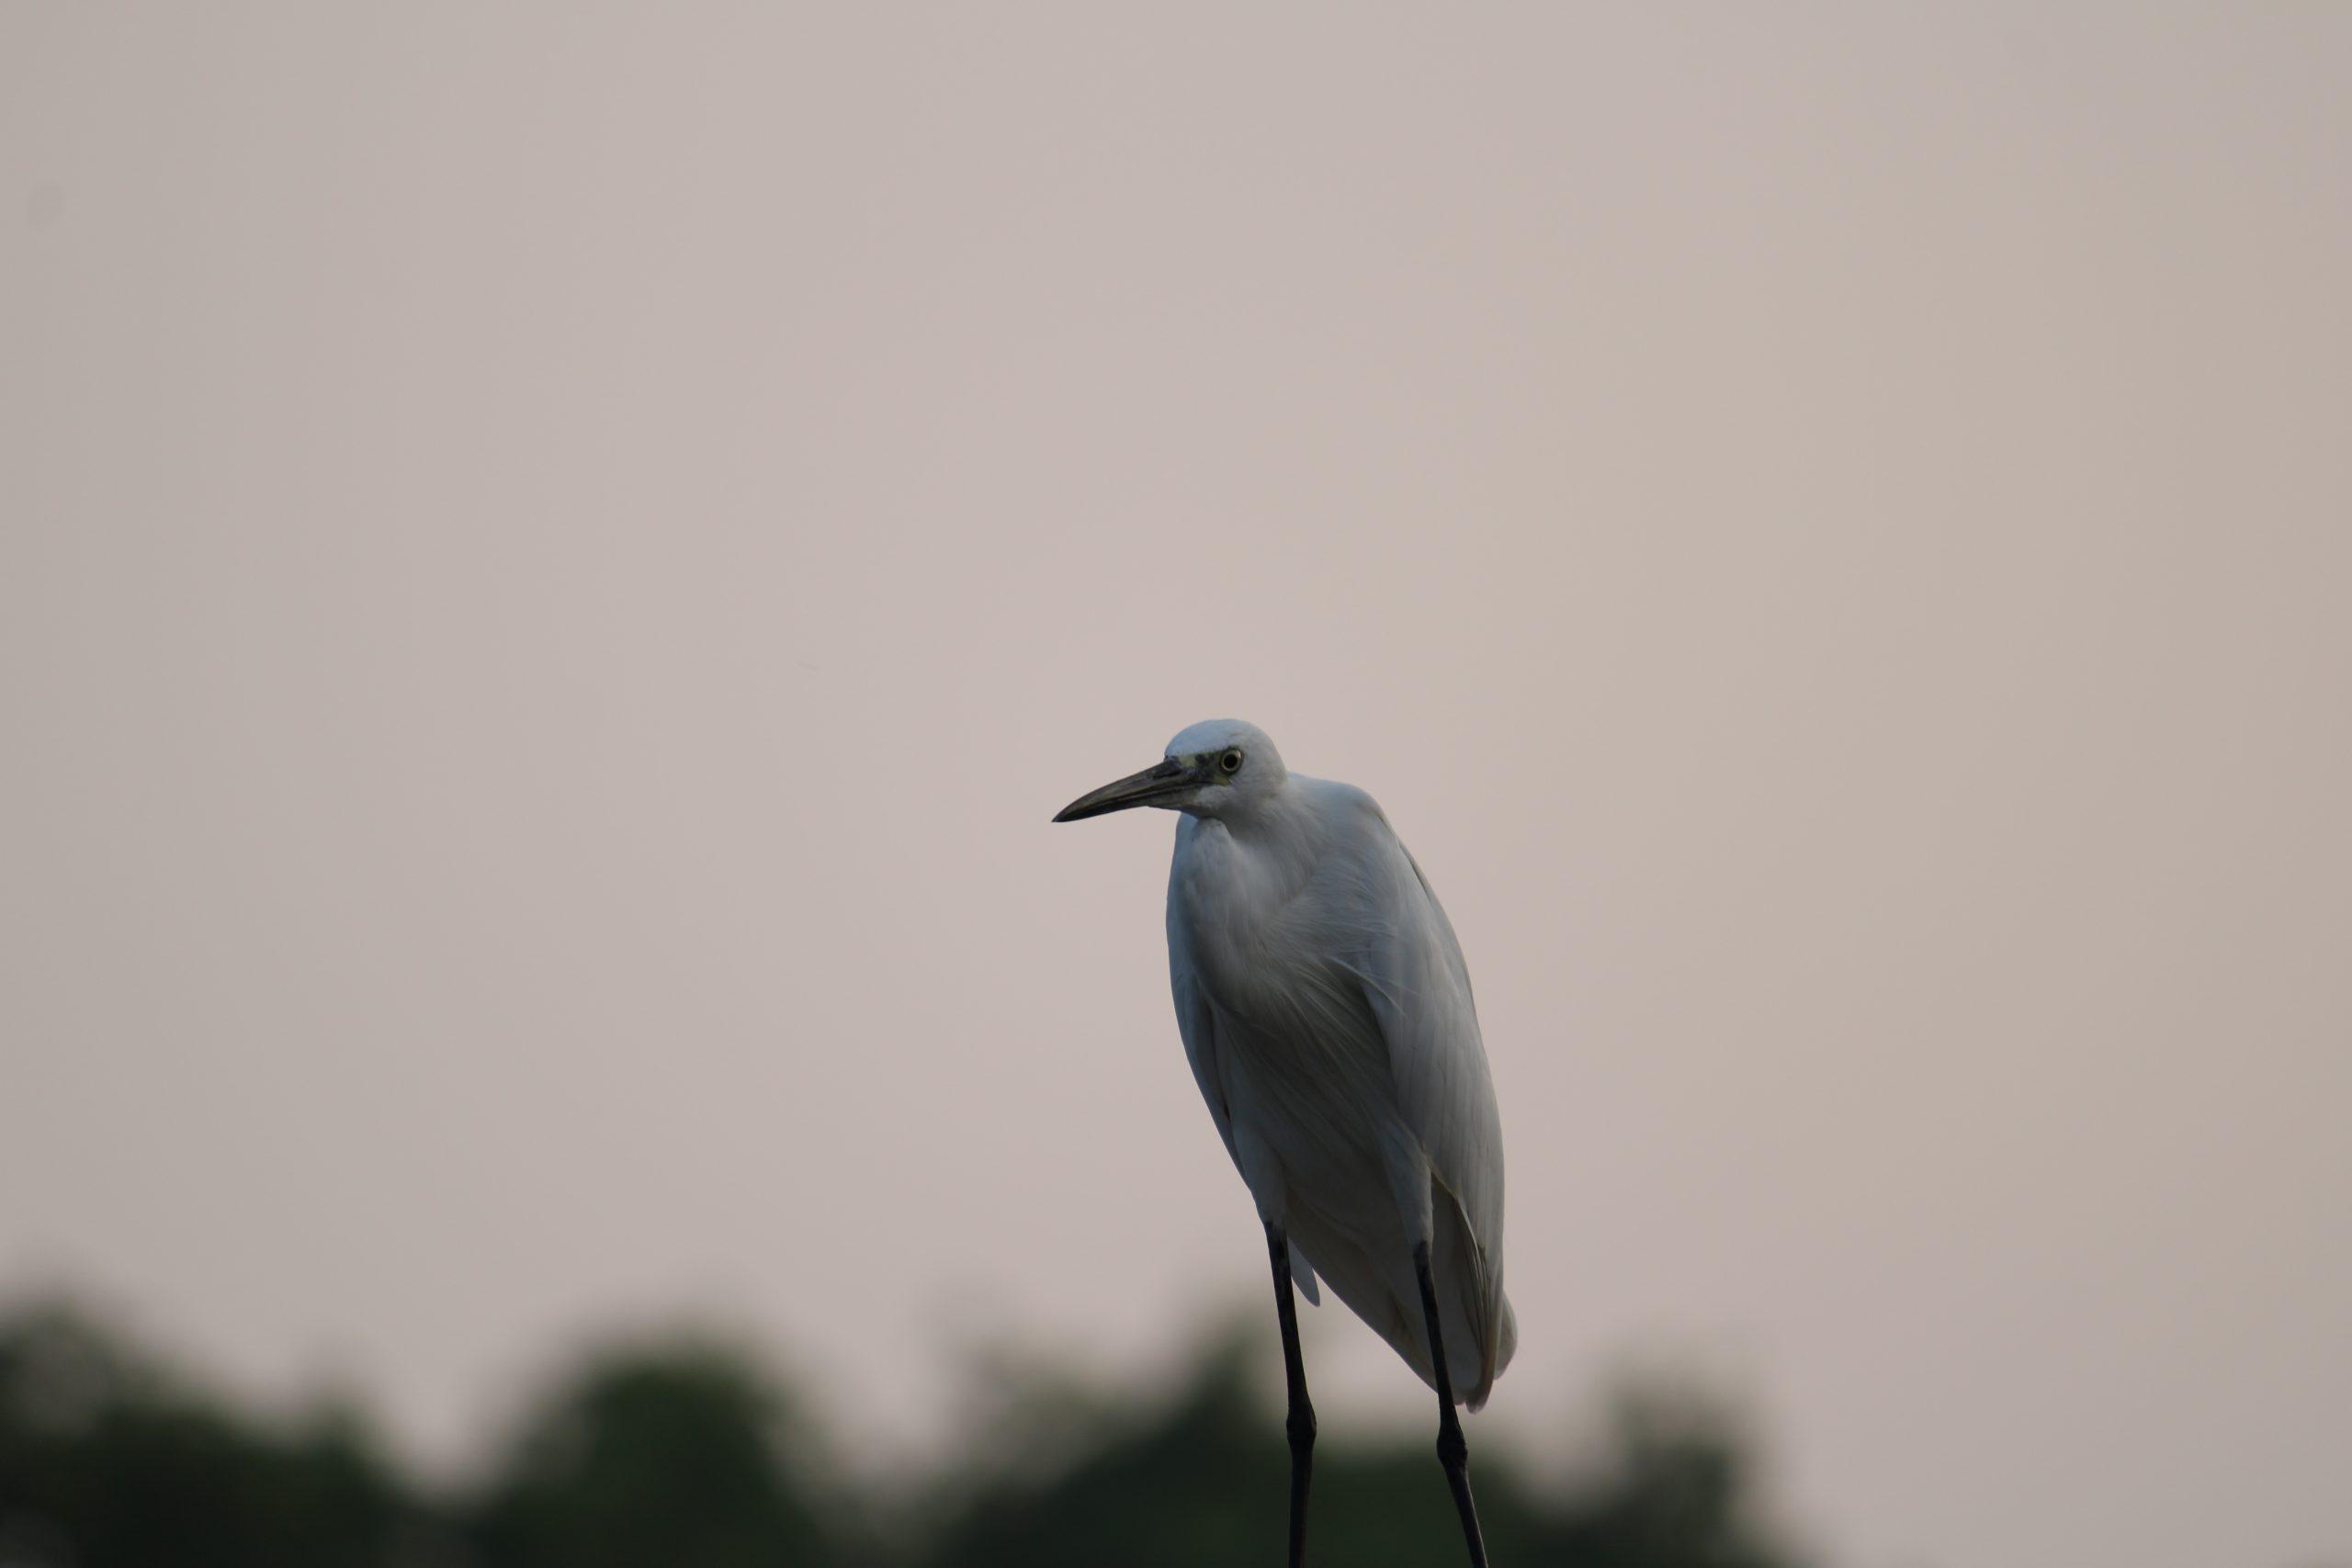 Crane bird macro view